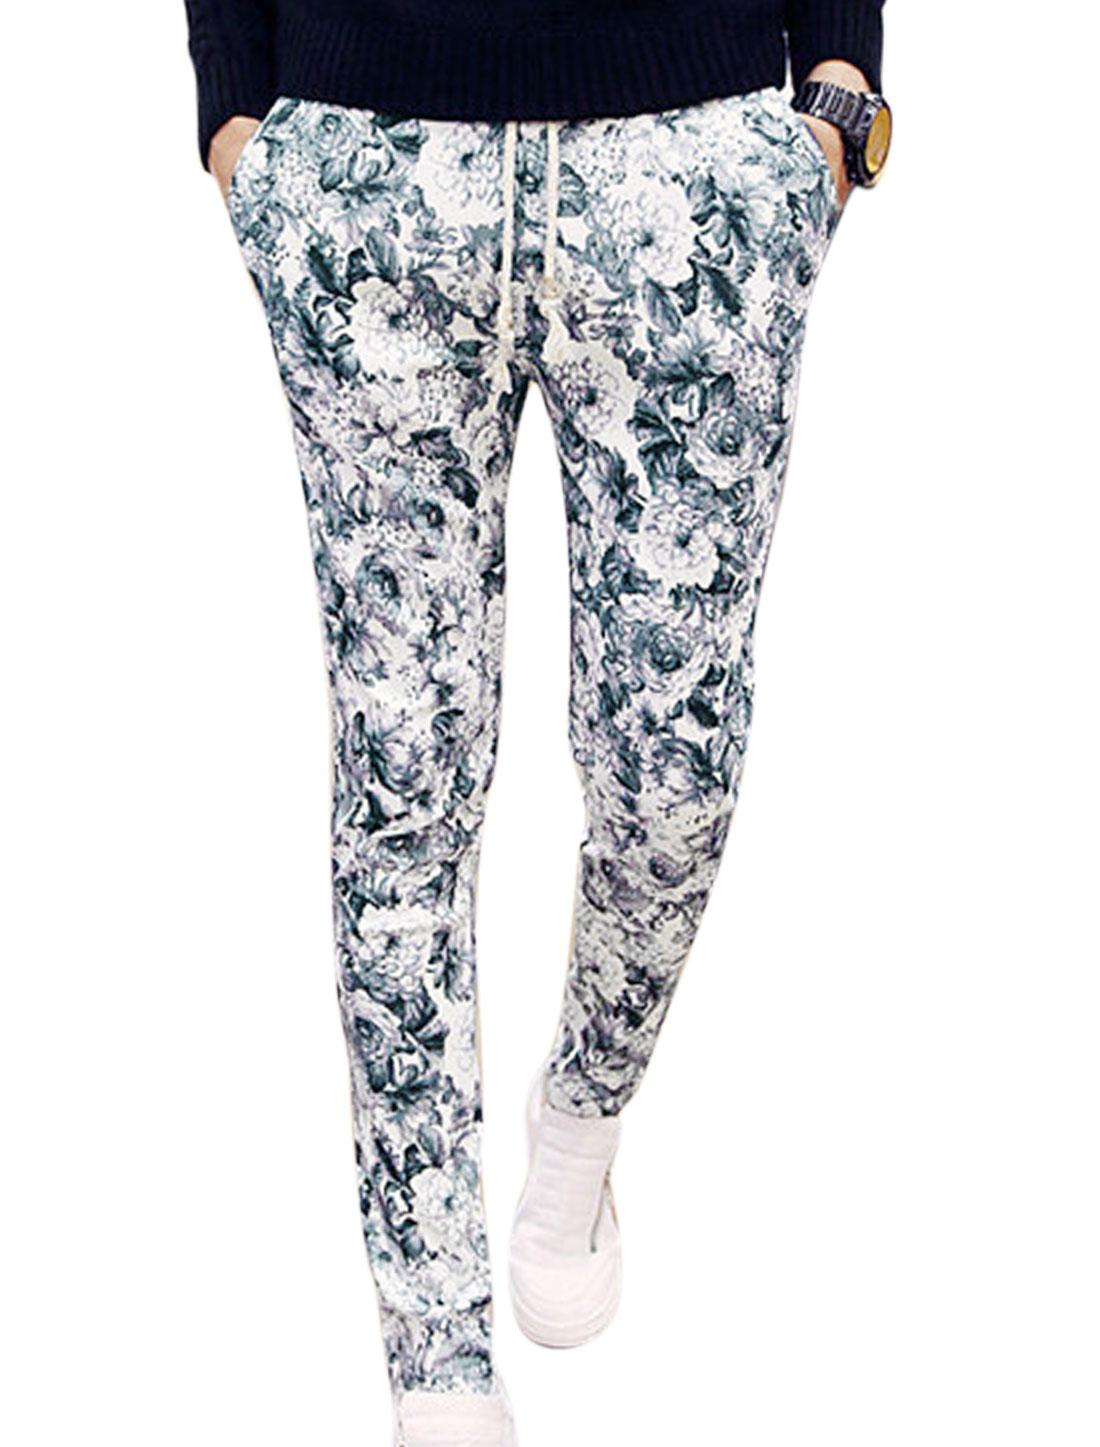 Men Floral Prints Drawcord Waist Slant Pockets Casual Pants Beige Black W28